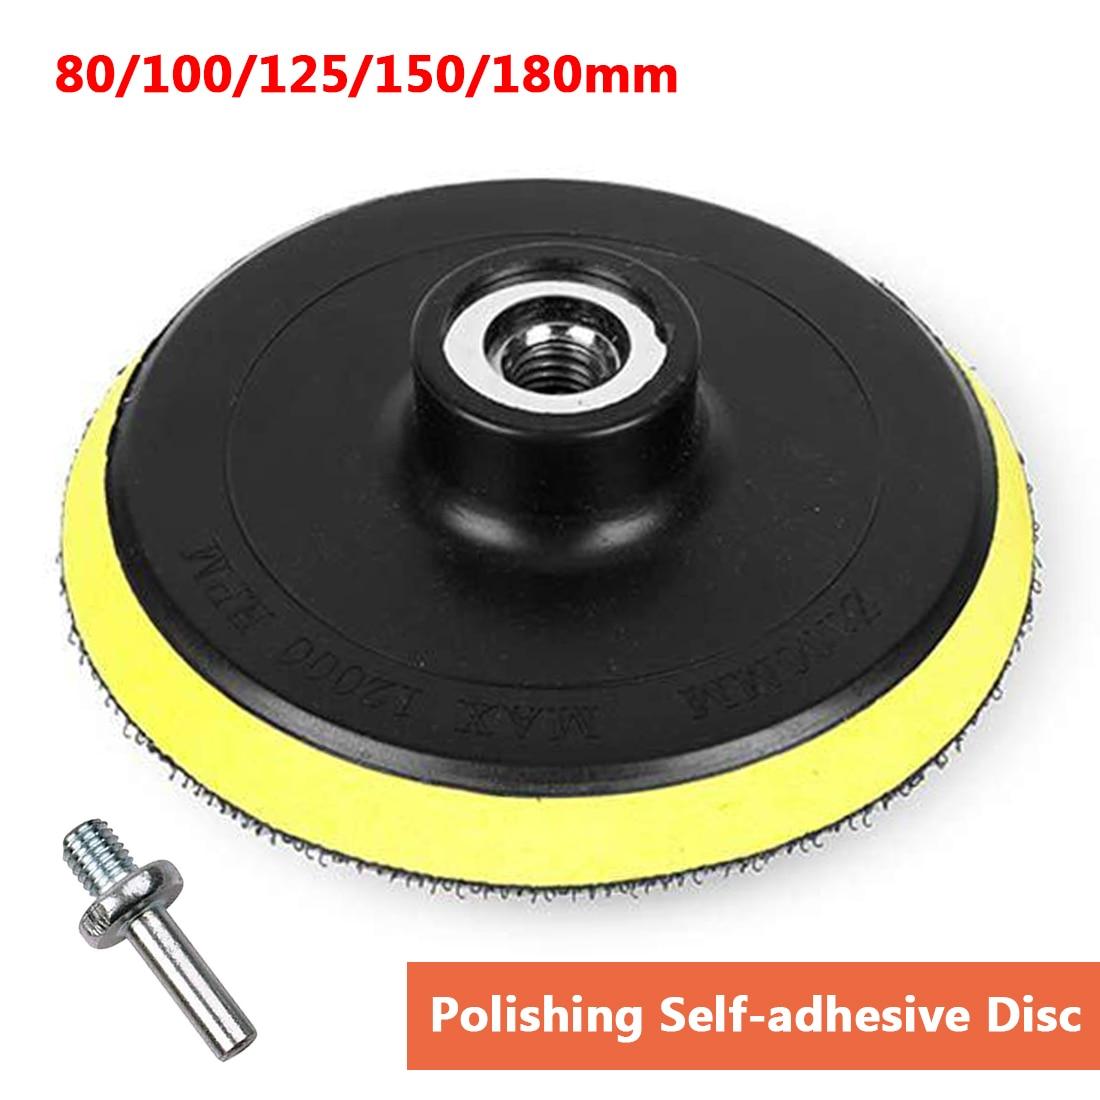 Self-adhesive Sticky Disk Polishing Disc  3